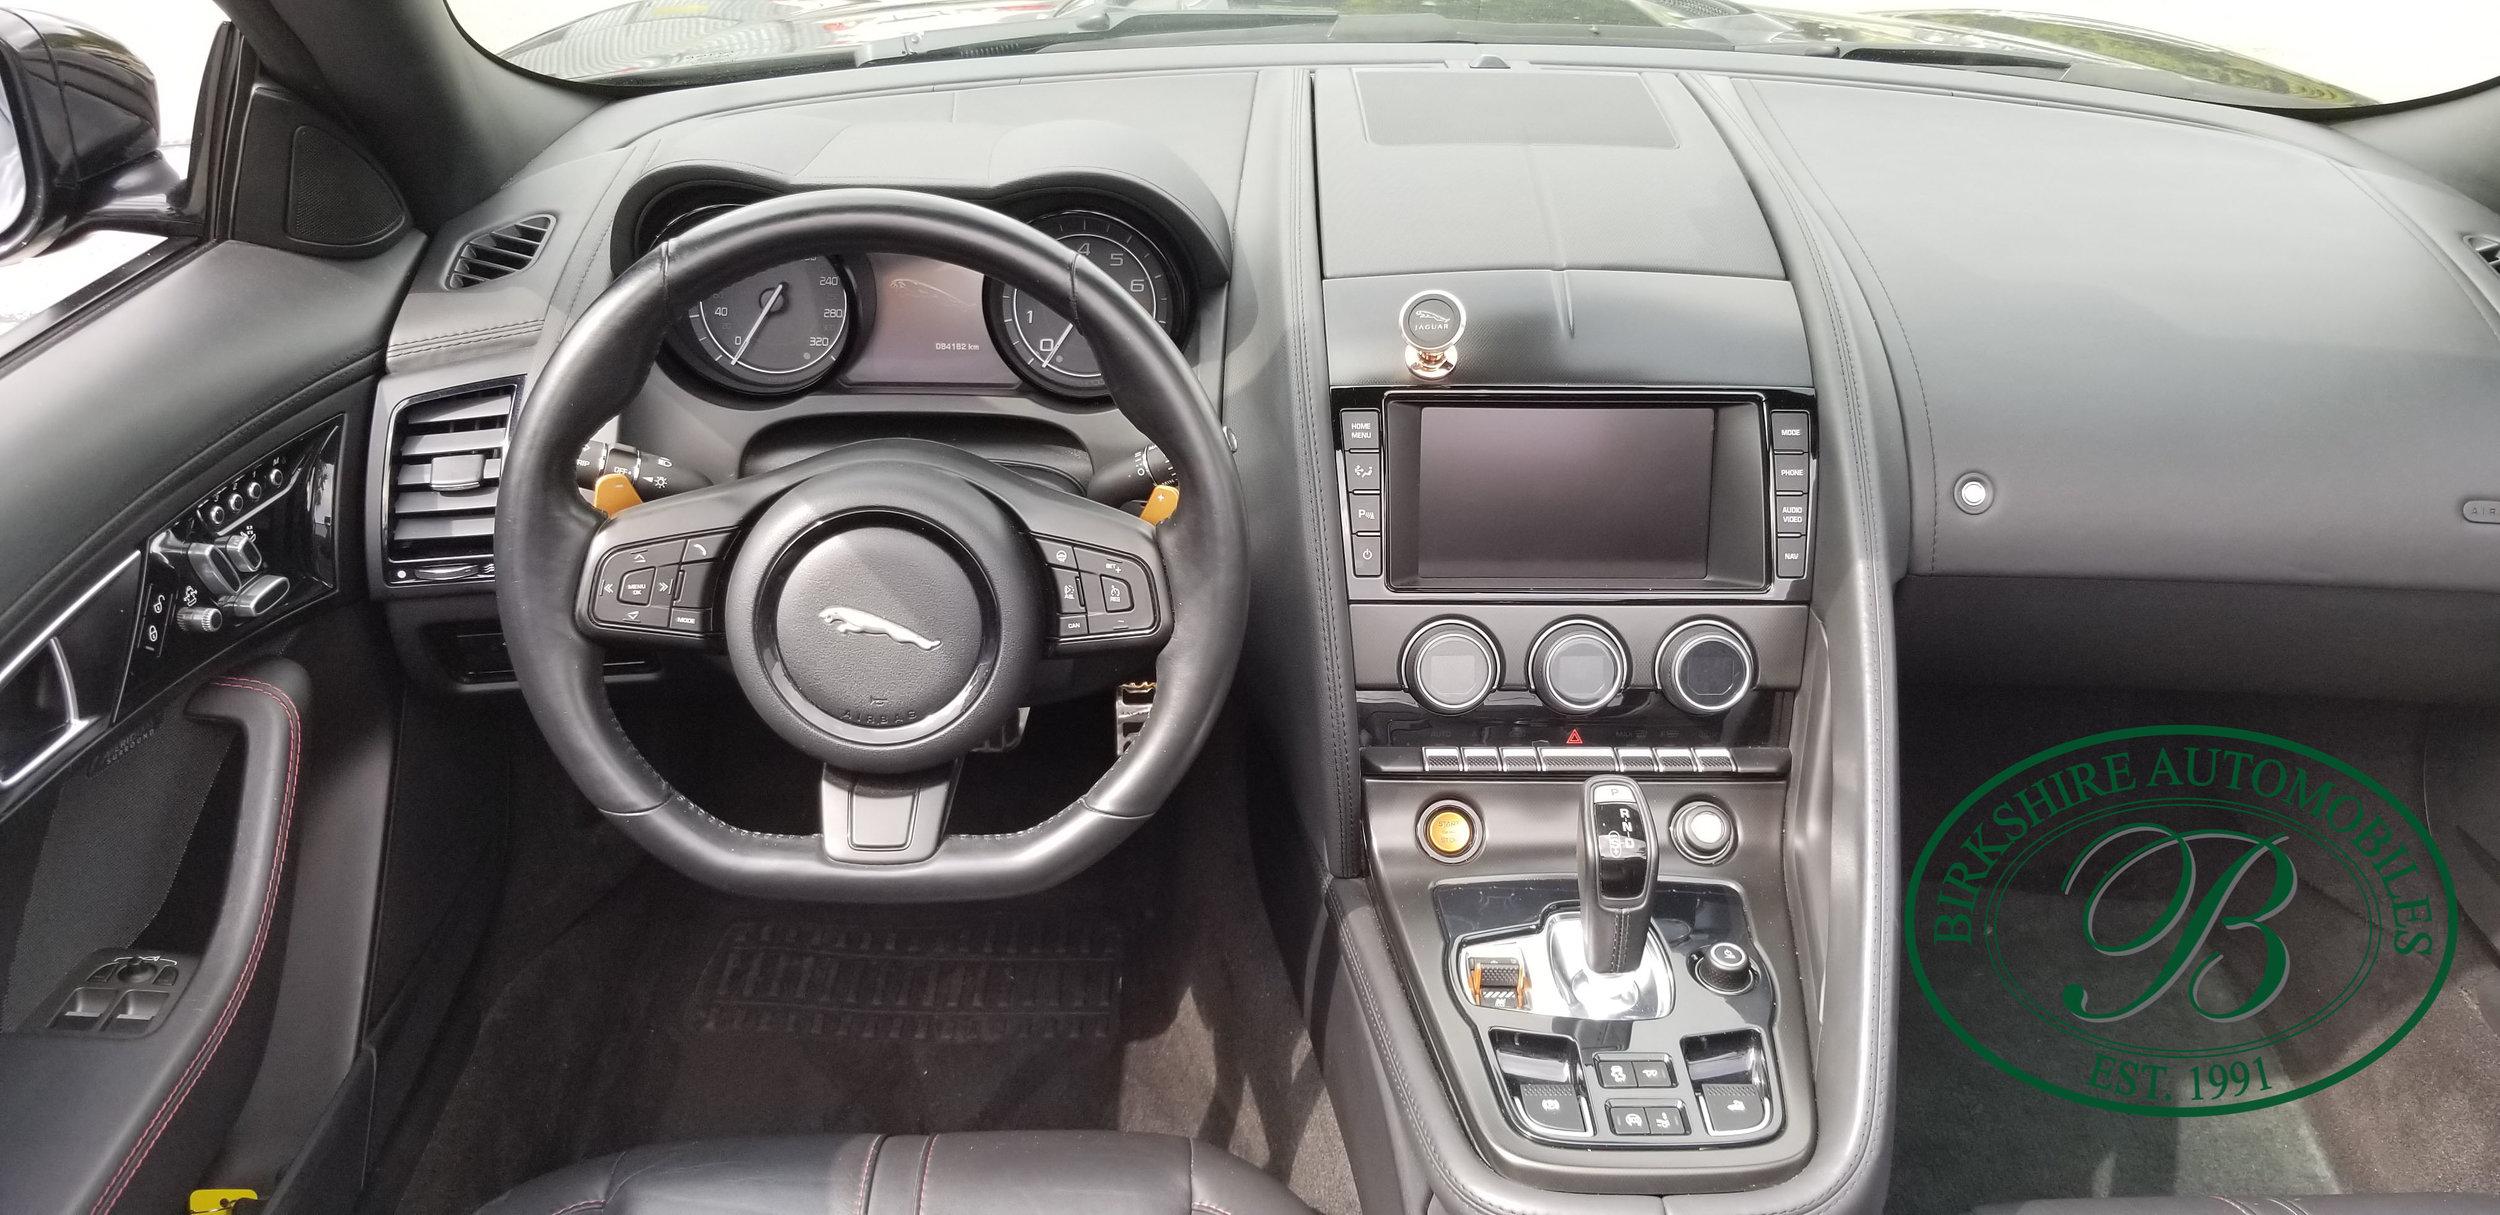 2014 F-Type V8 S - Birkshire Automobiles (75).jpg